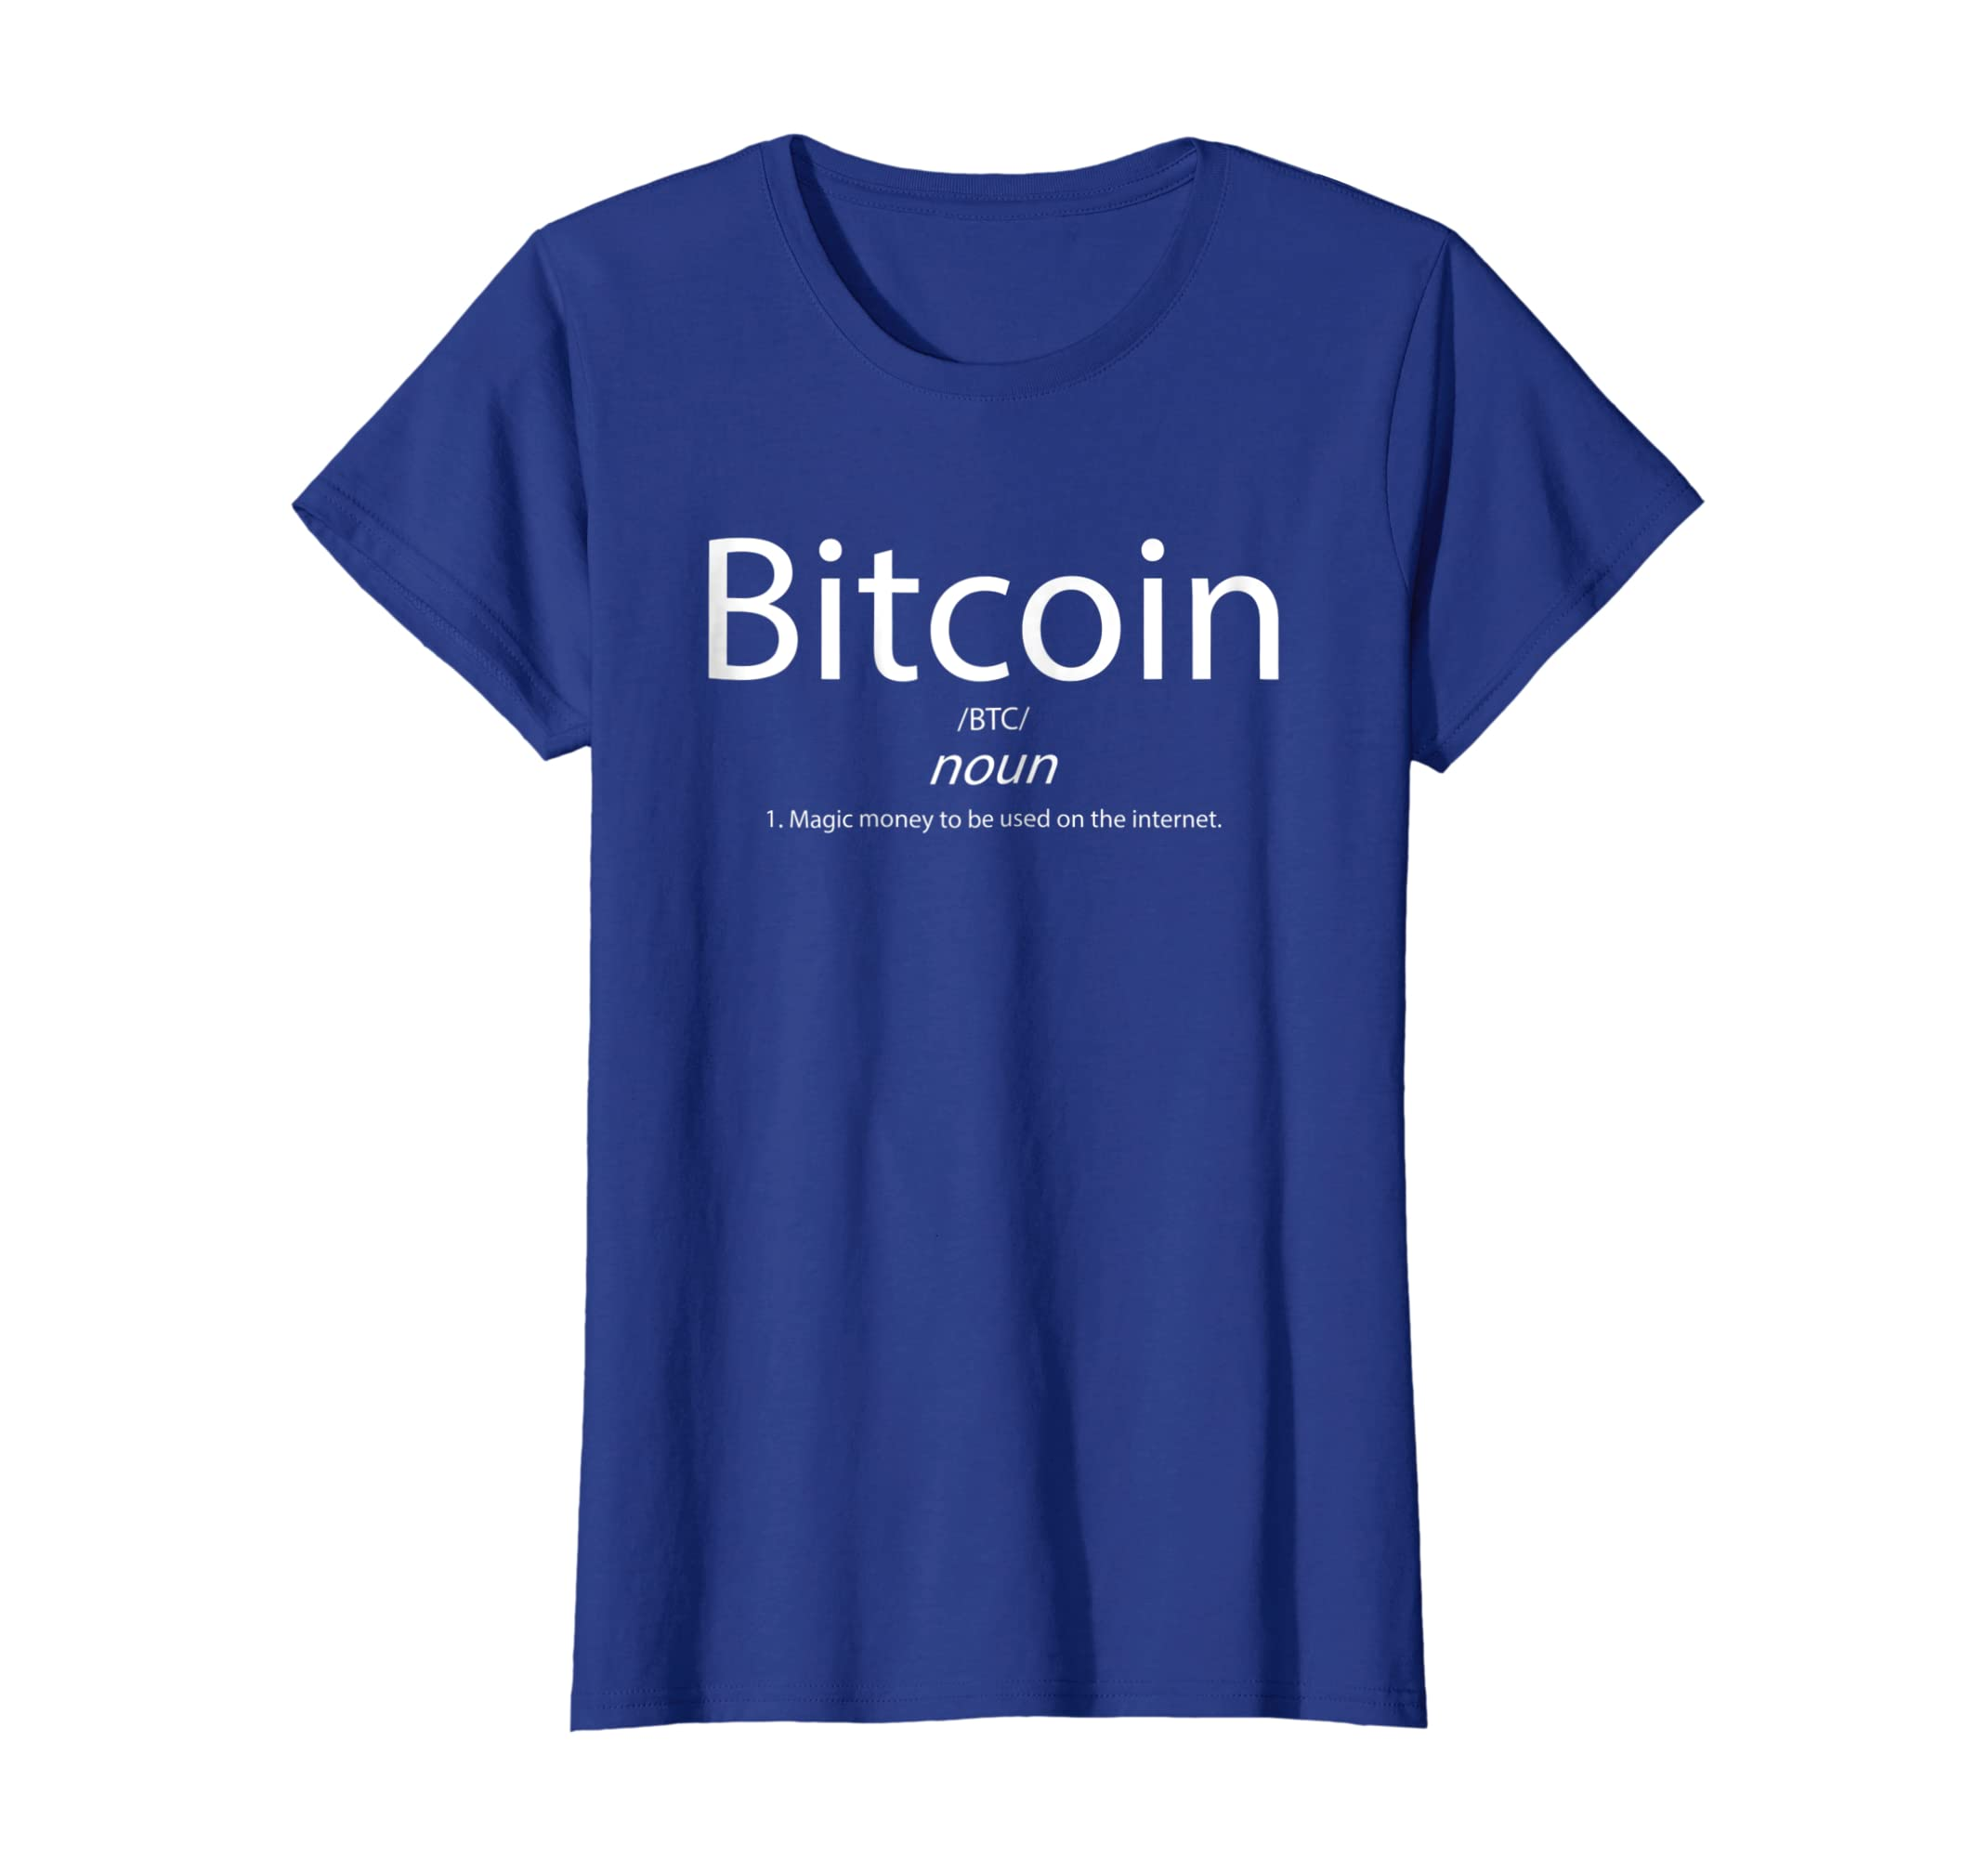 b92a2252eecf Amazon.com: Bitcoin Definition Shirt - Cryptocurrency Blockchain Crypto:  Clothing